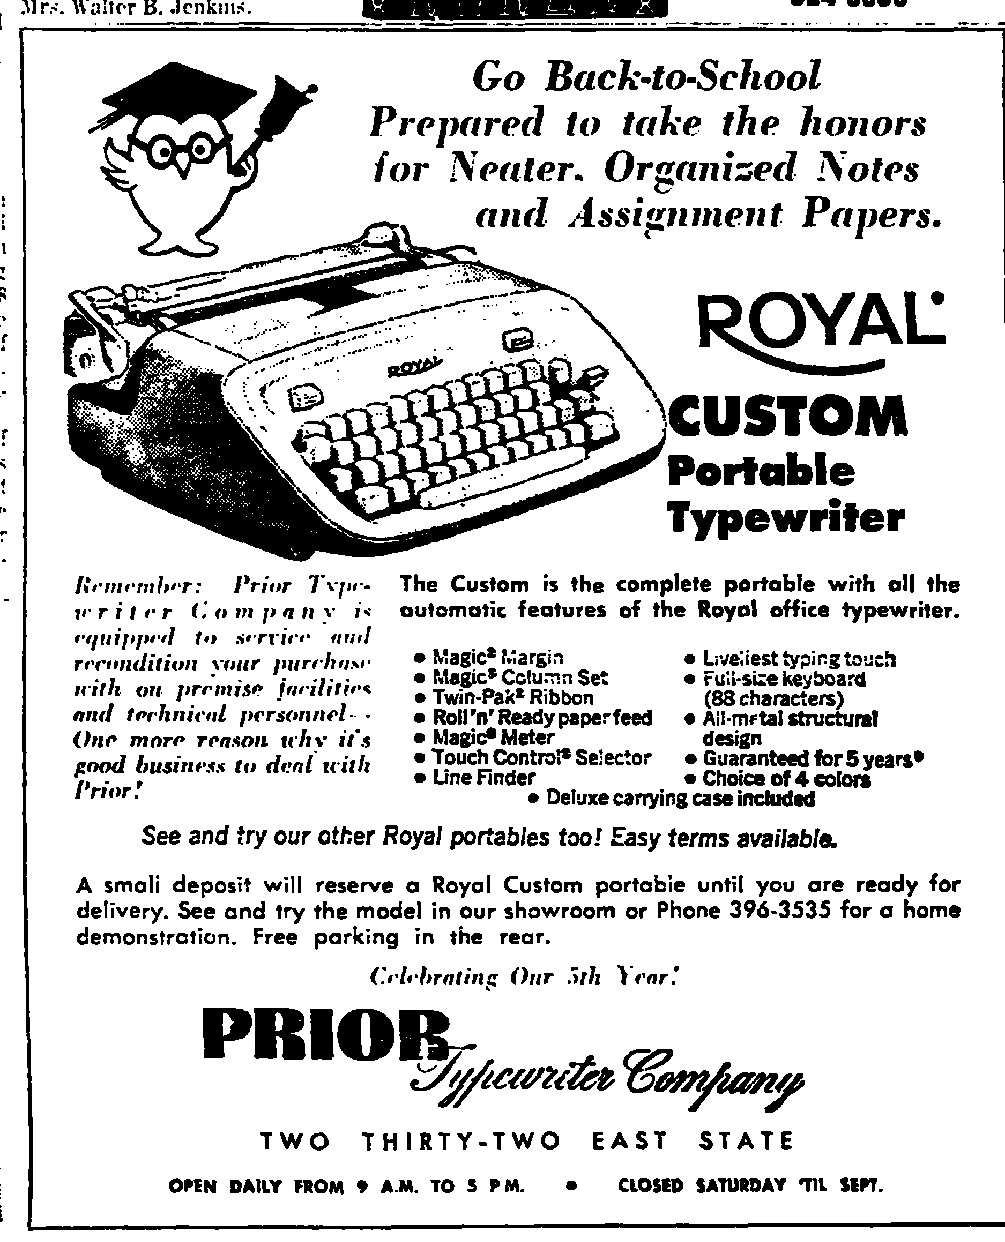 Seattle-Firs Typewriter: February 2014